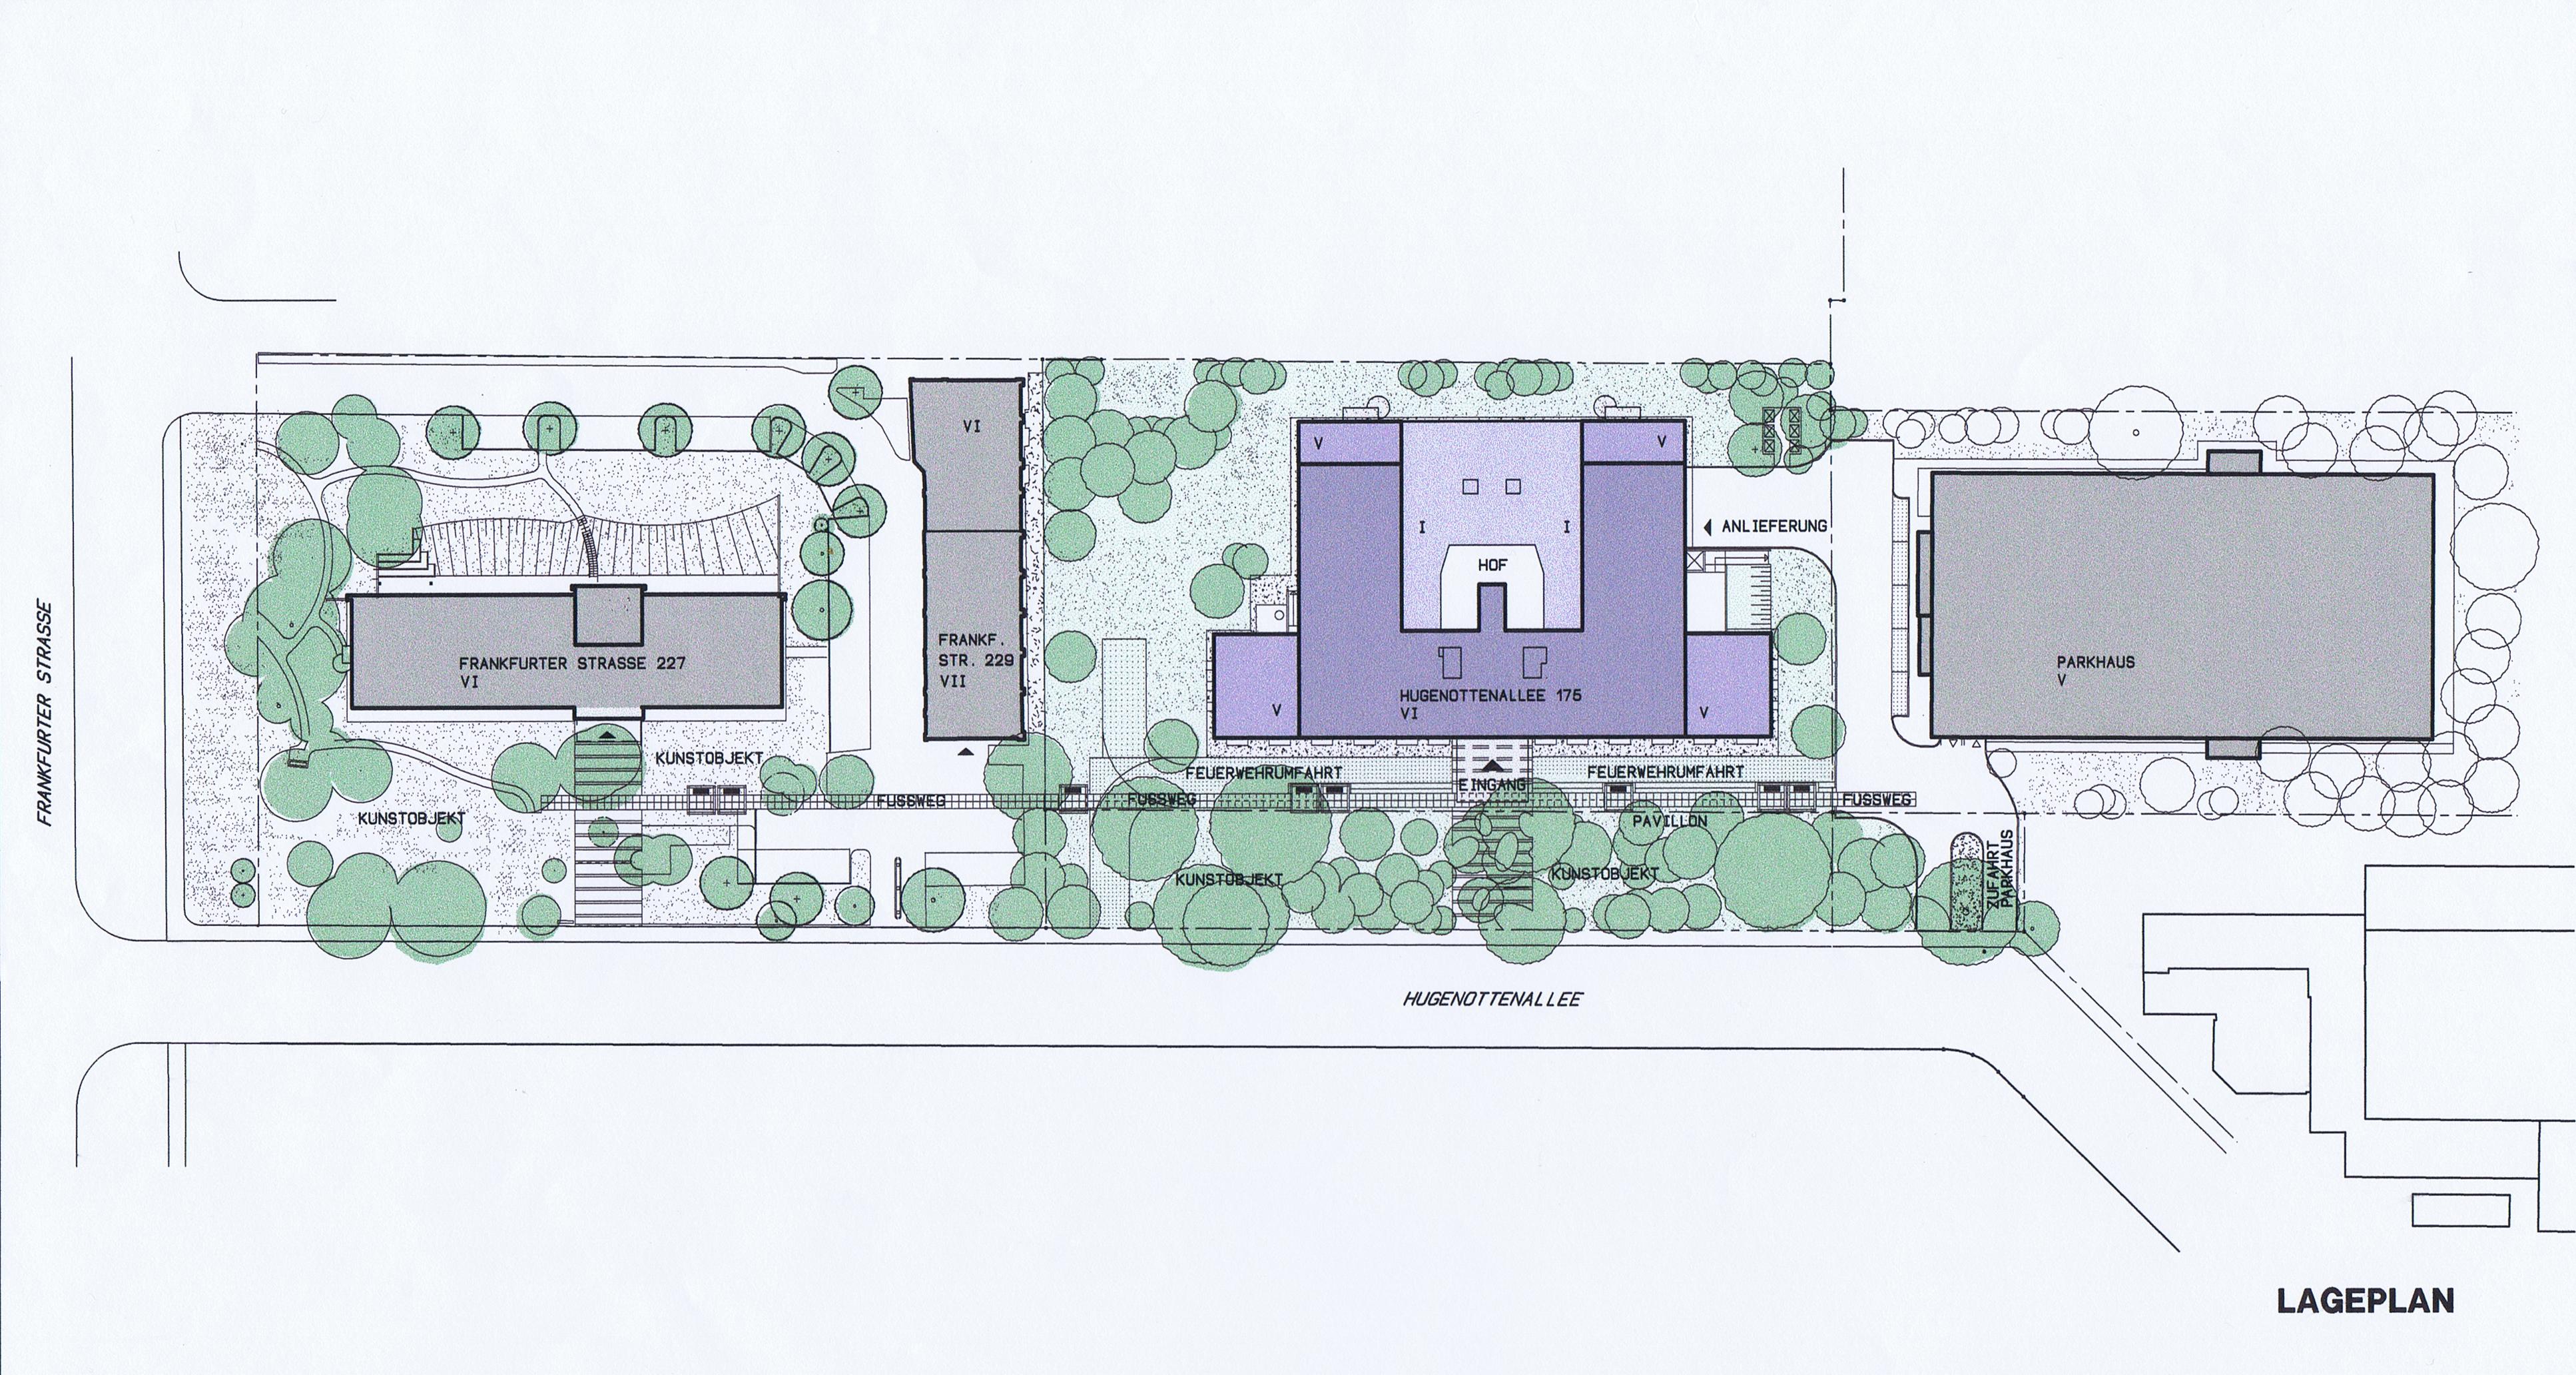 Lageplan Bürogebäude Hugenottenalle Neu-Isenburg